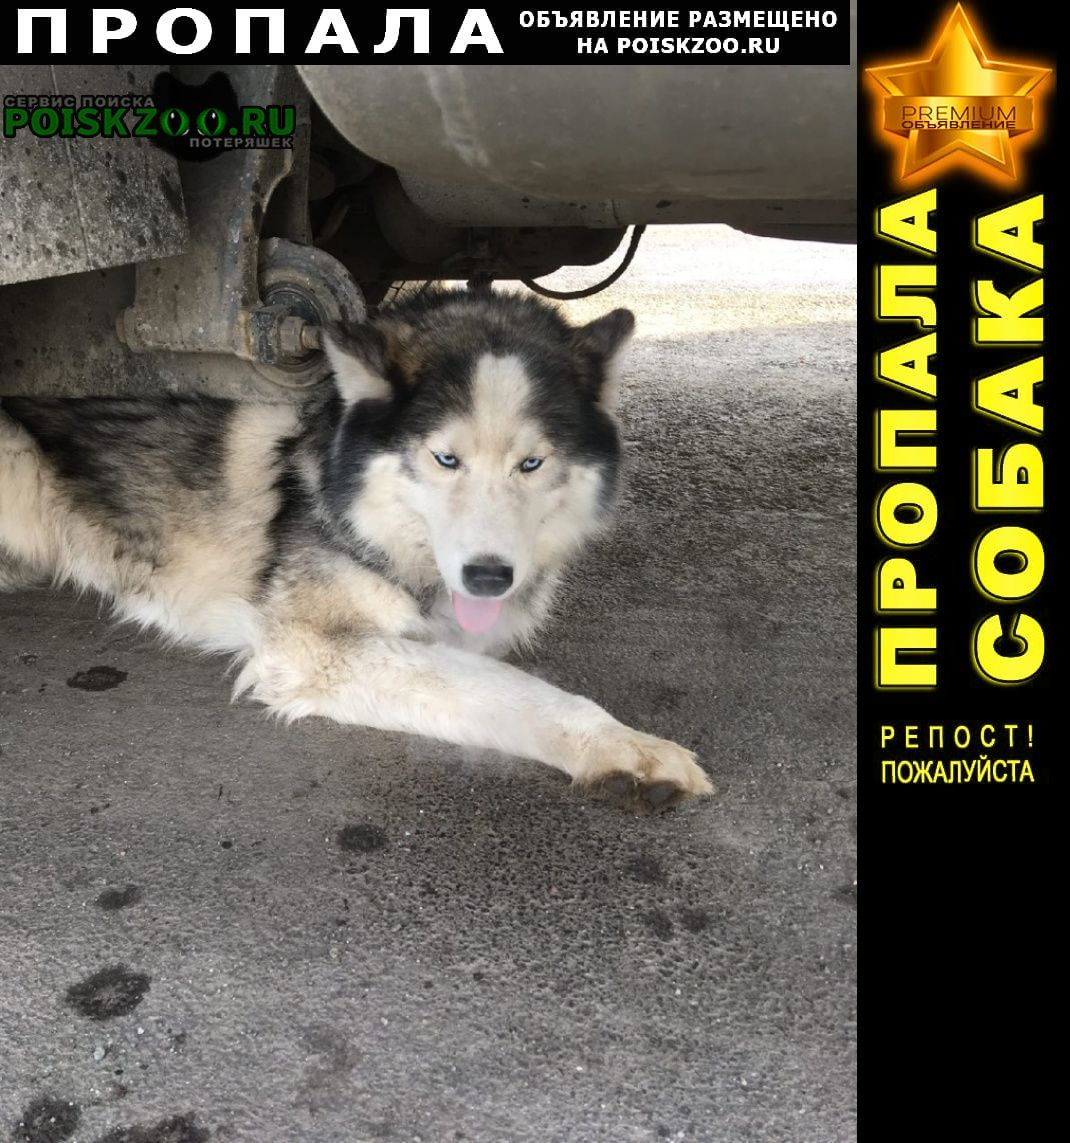 Пропала собака Копейск